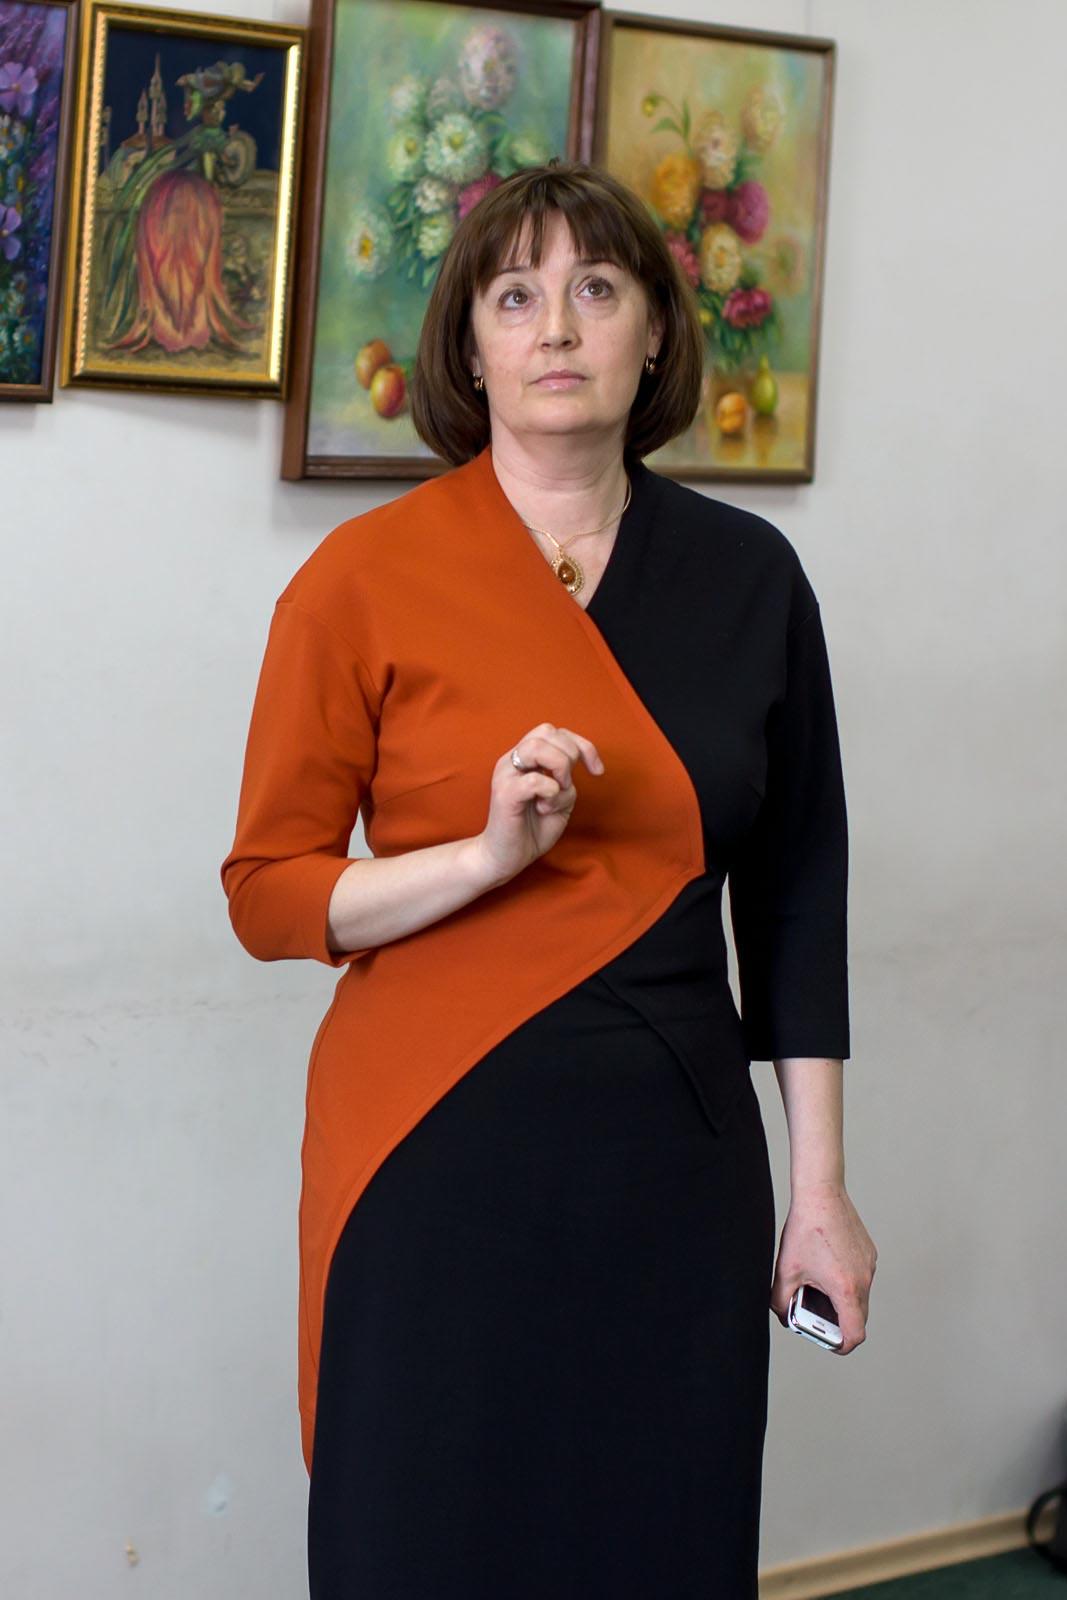 Фото №148102. Директор галереи ''Сакура'' Степанова Наталья Викторовна